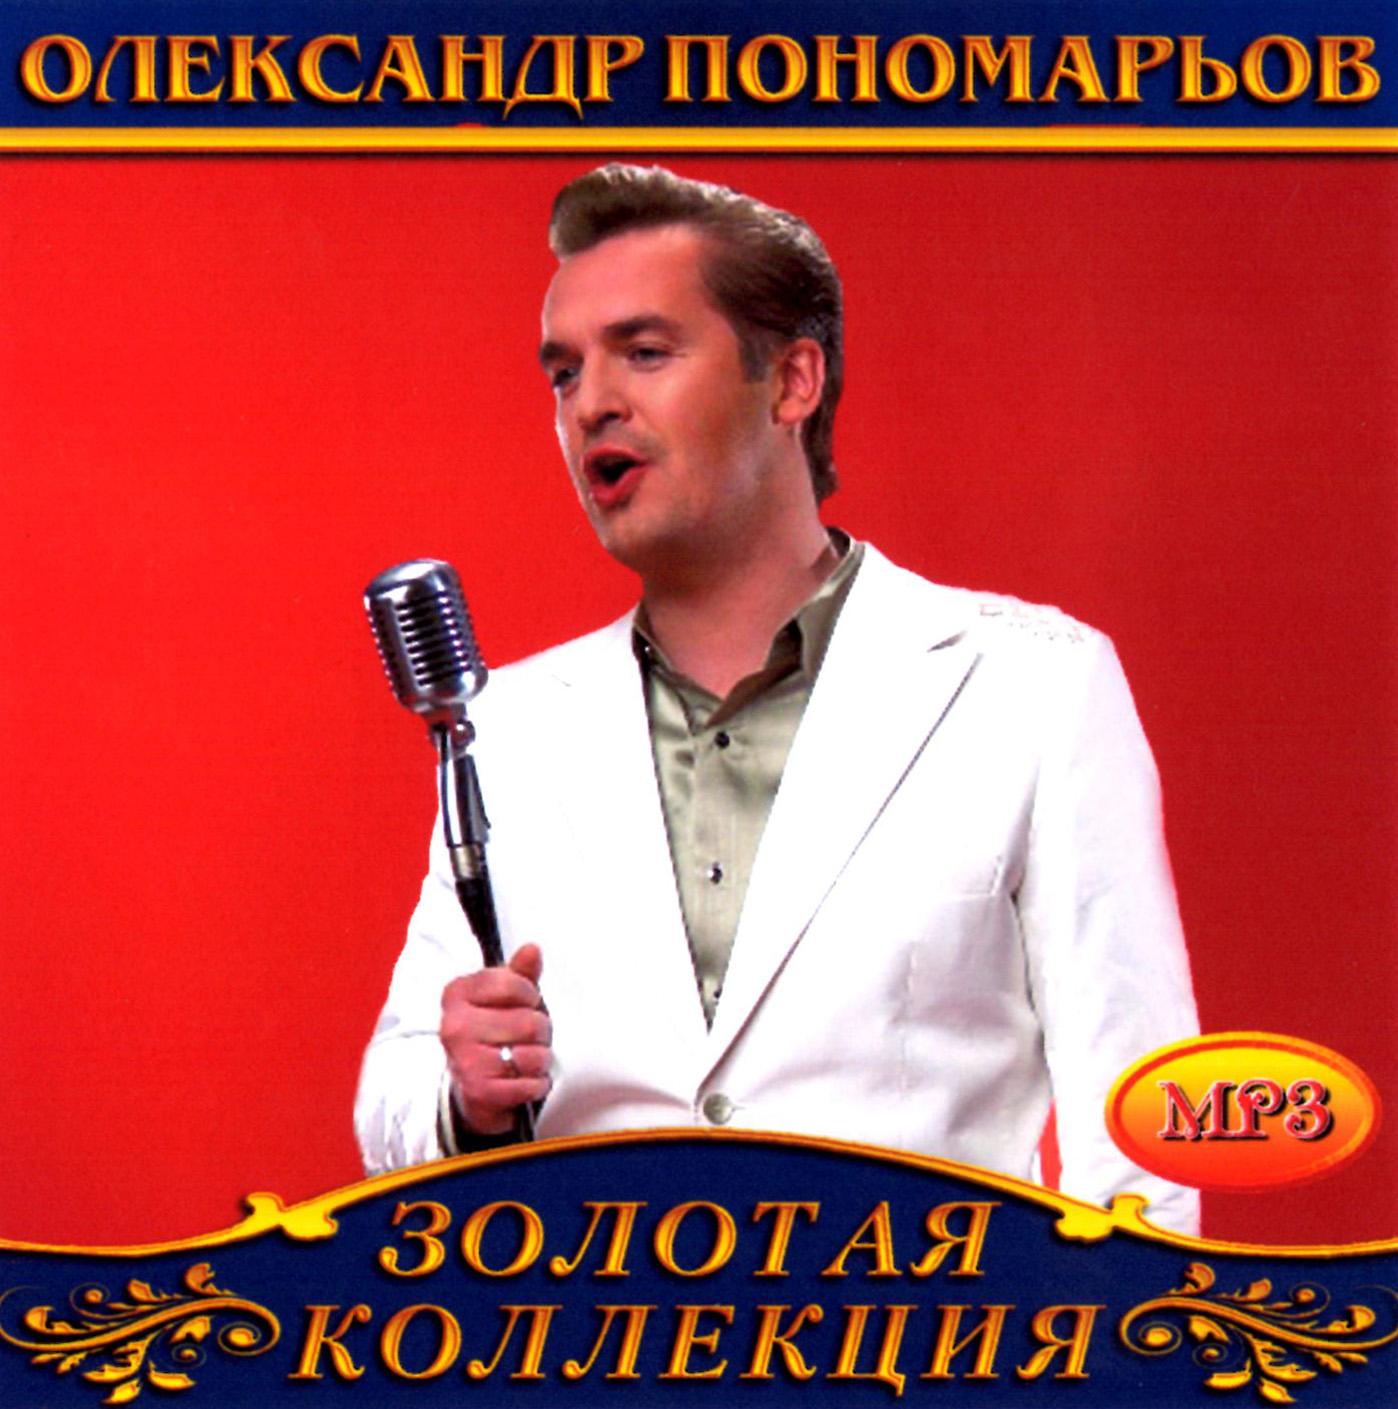 Олександр Пономарьов [mp3]